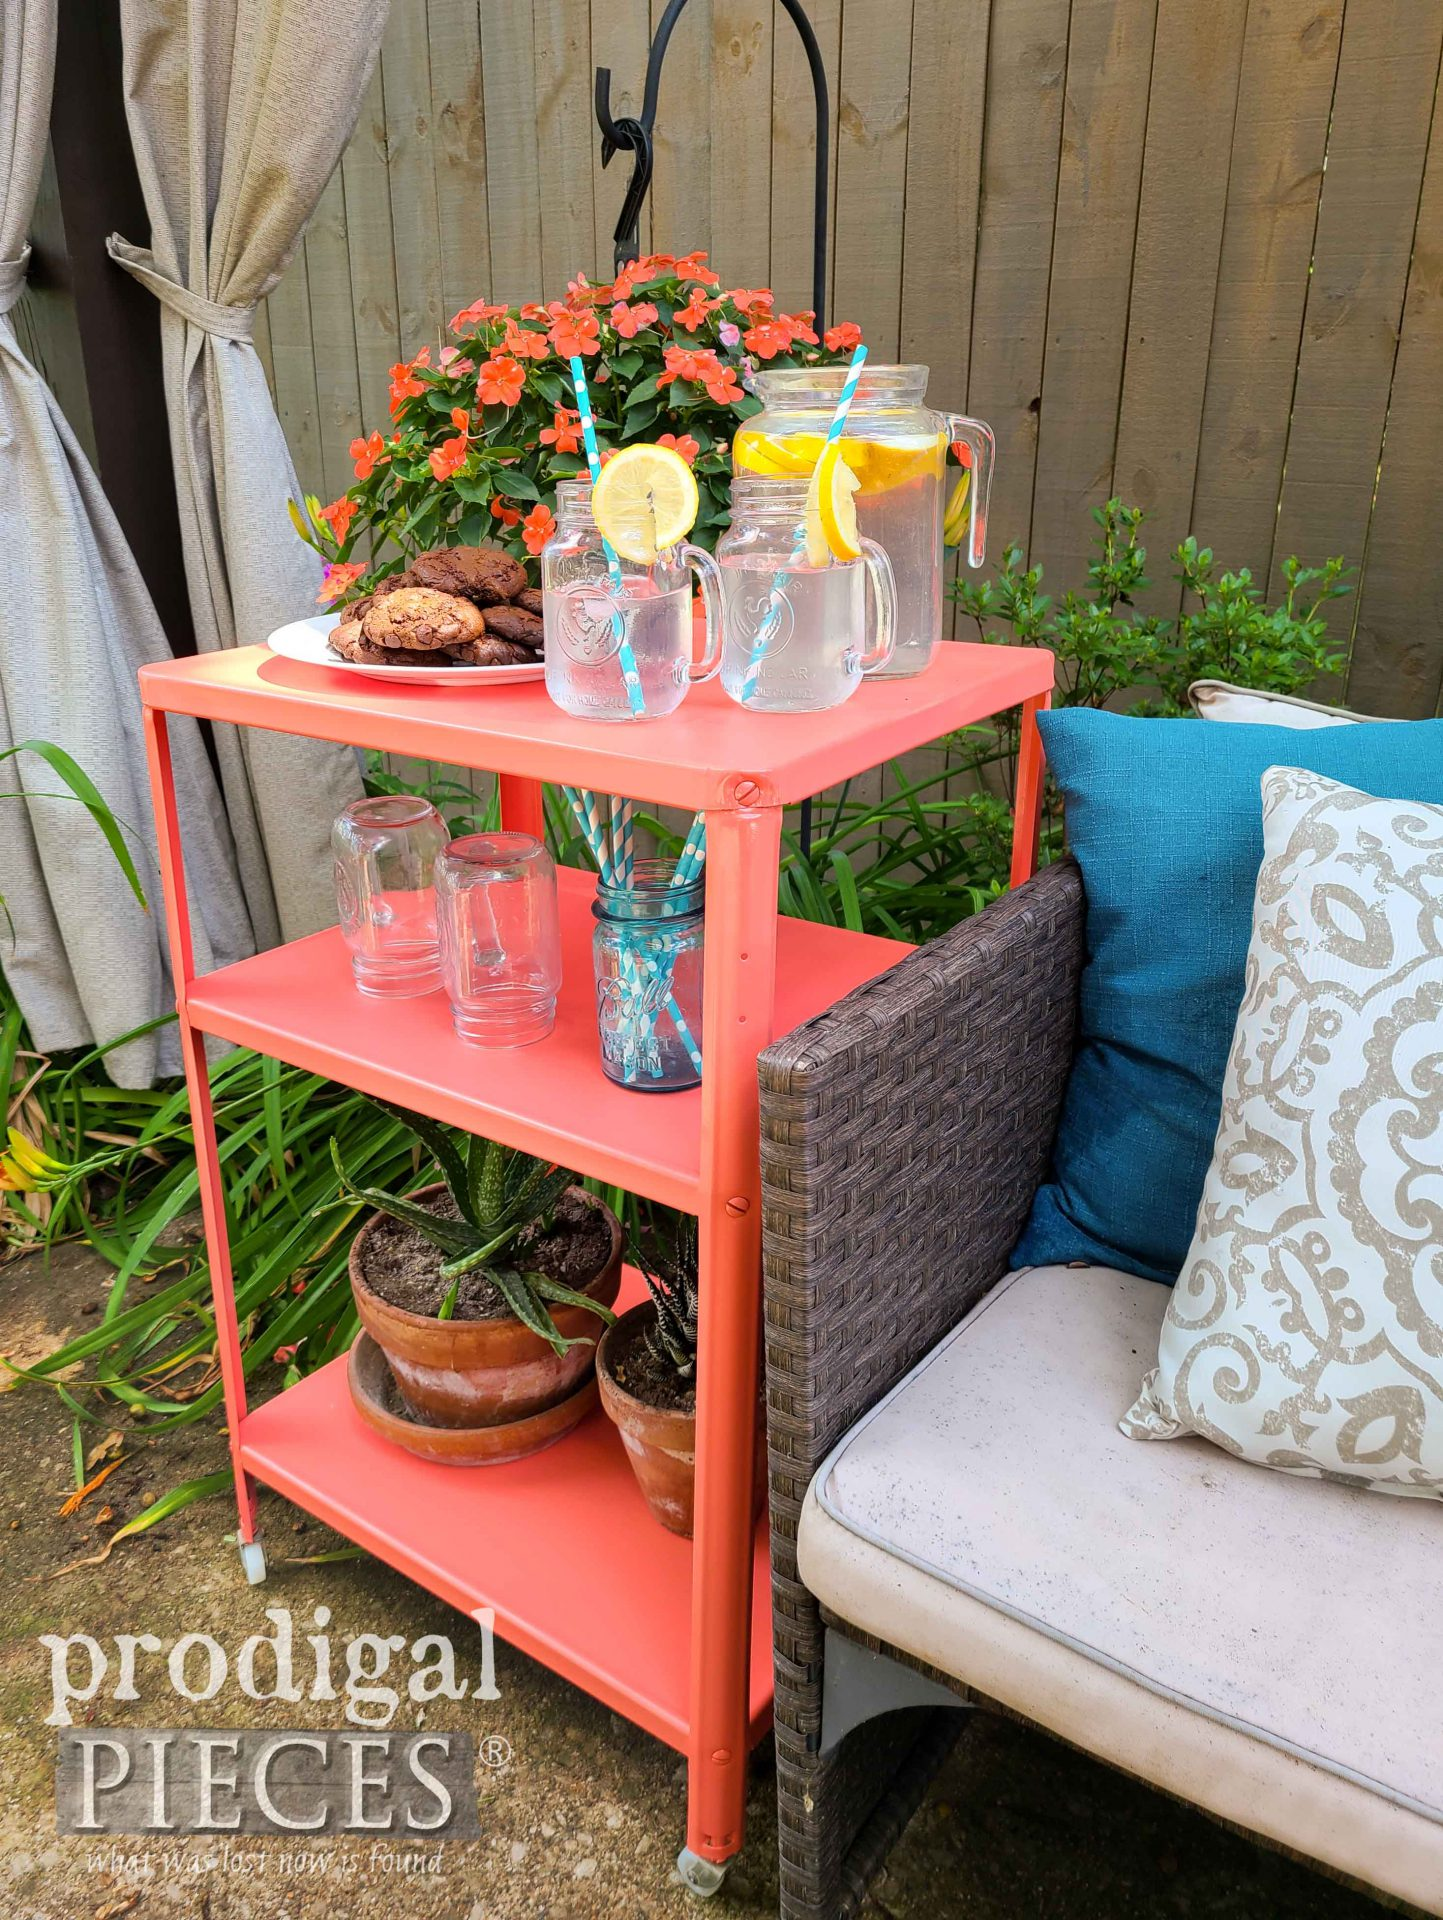 Patio Vintage Serving Cart for Color Fun by Larissa of Prodigla Pieces | prodigalpieces.com #prodigalpieces #diy #home #patio #homedecor